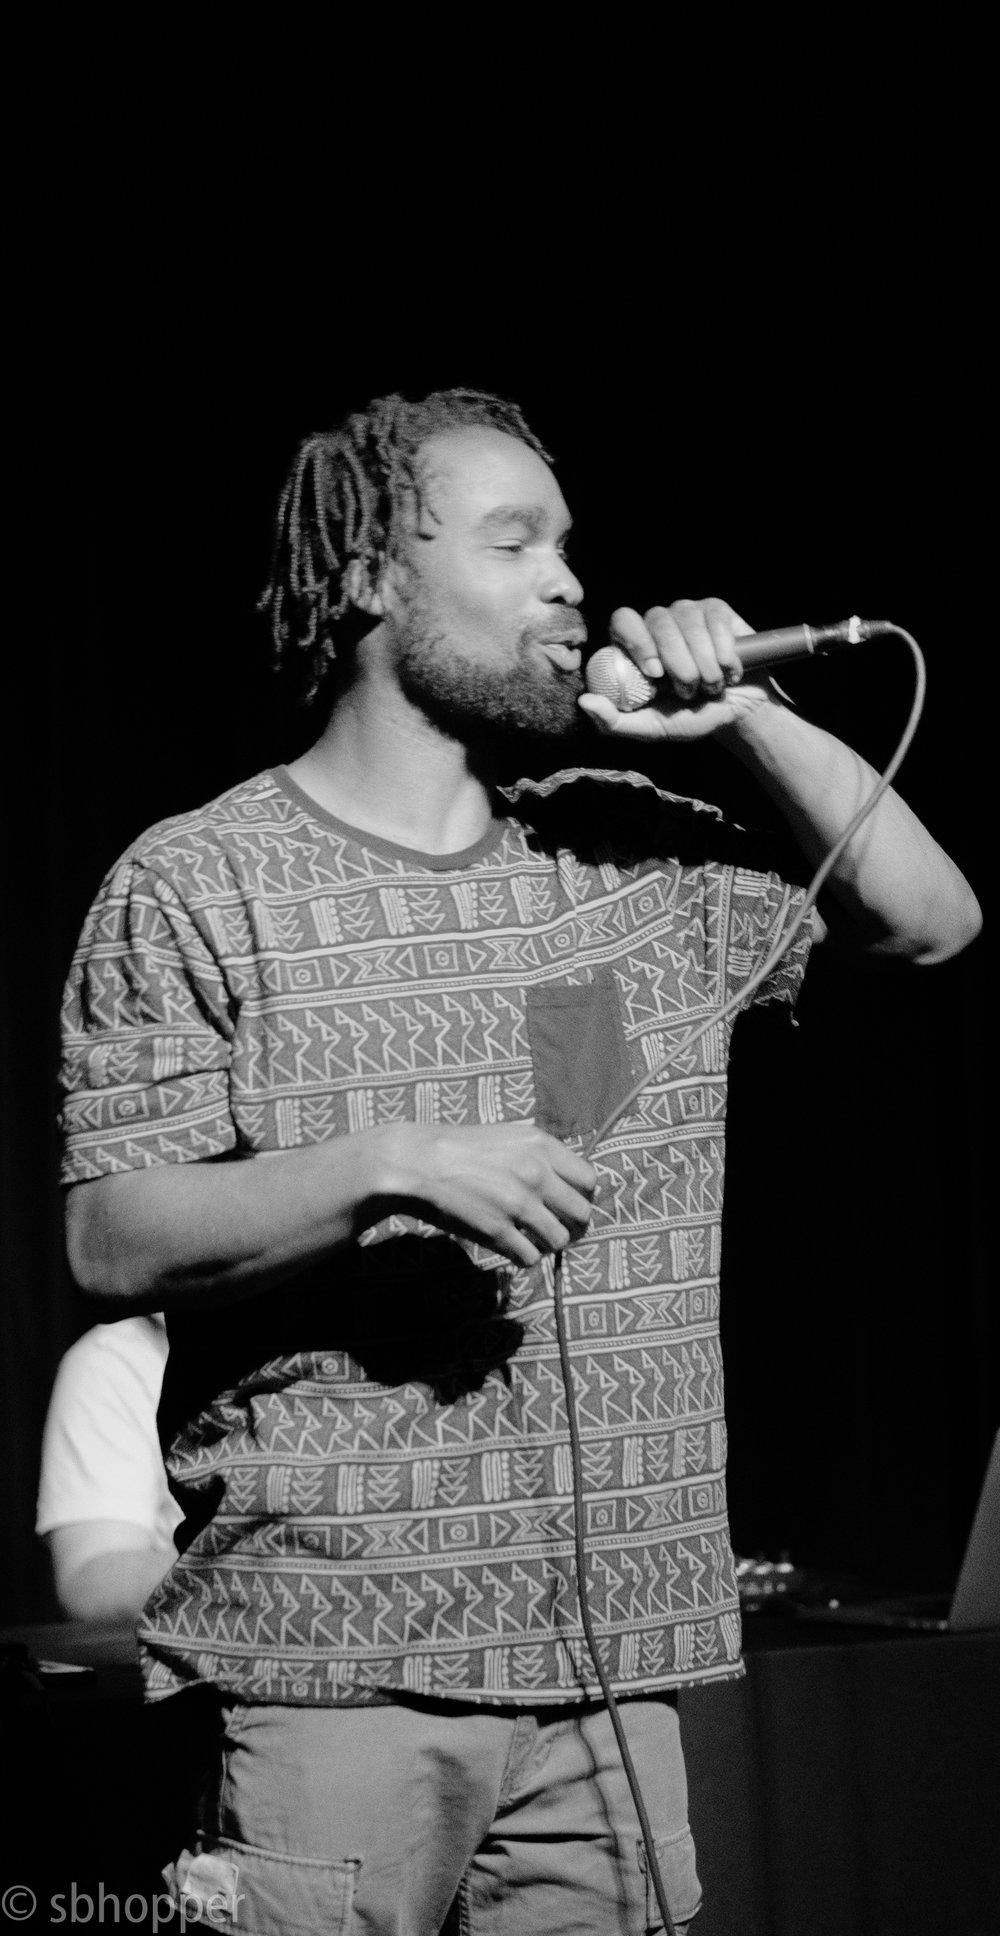 Rashuad at The Crocodile, 6 September 2017.